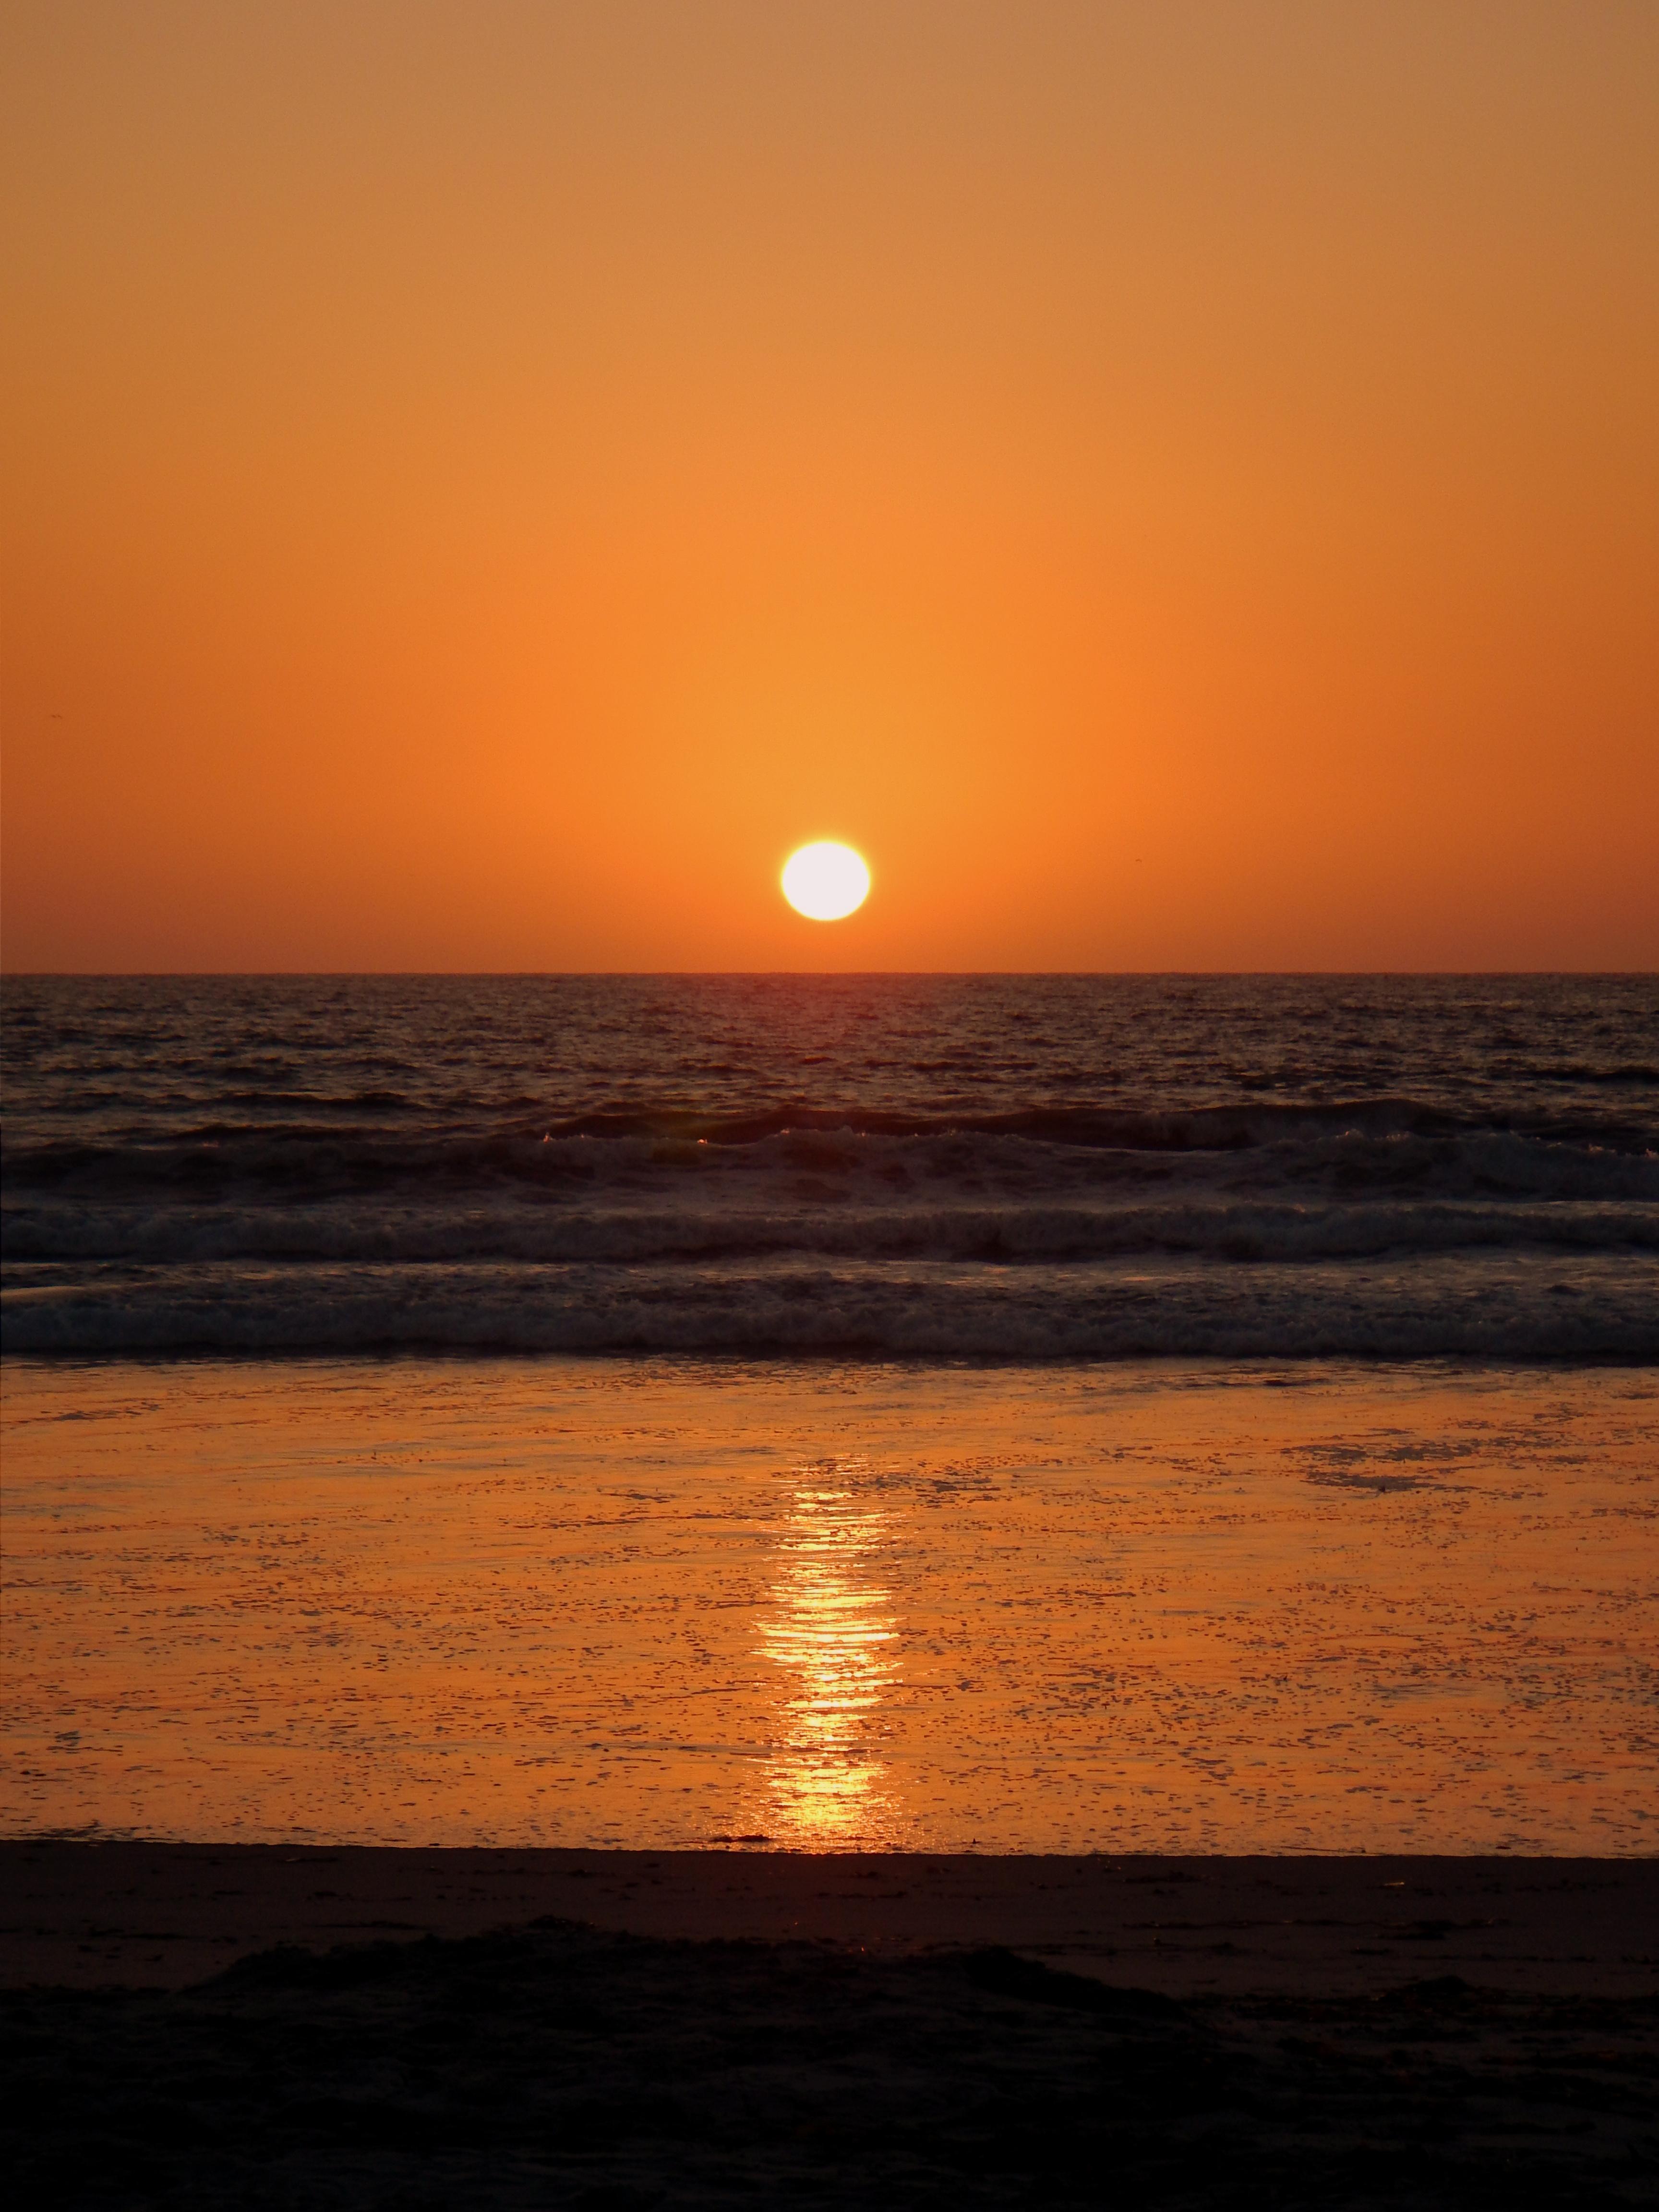 San Diego, Part 1: The Beaches